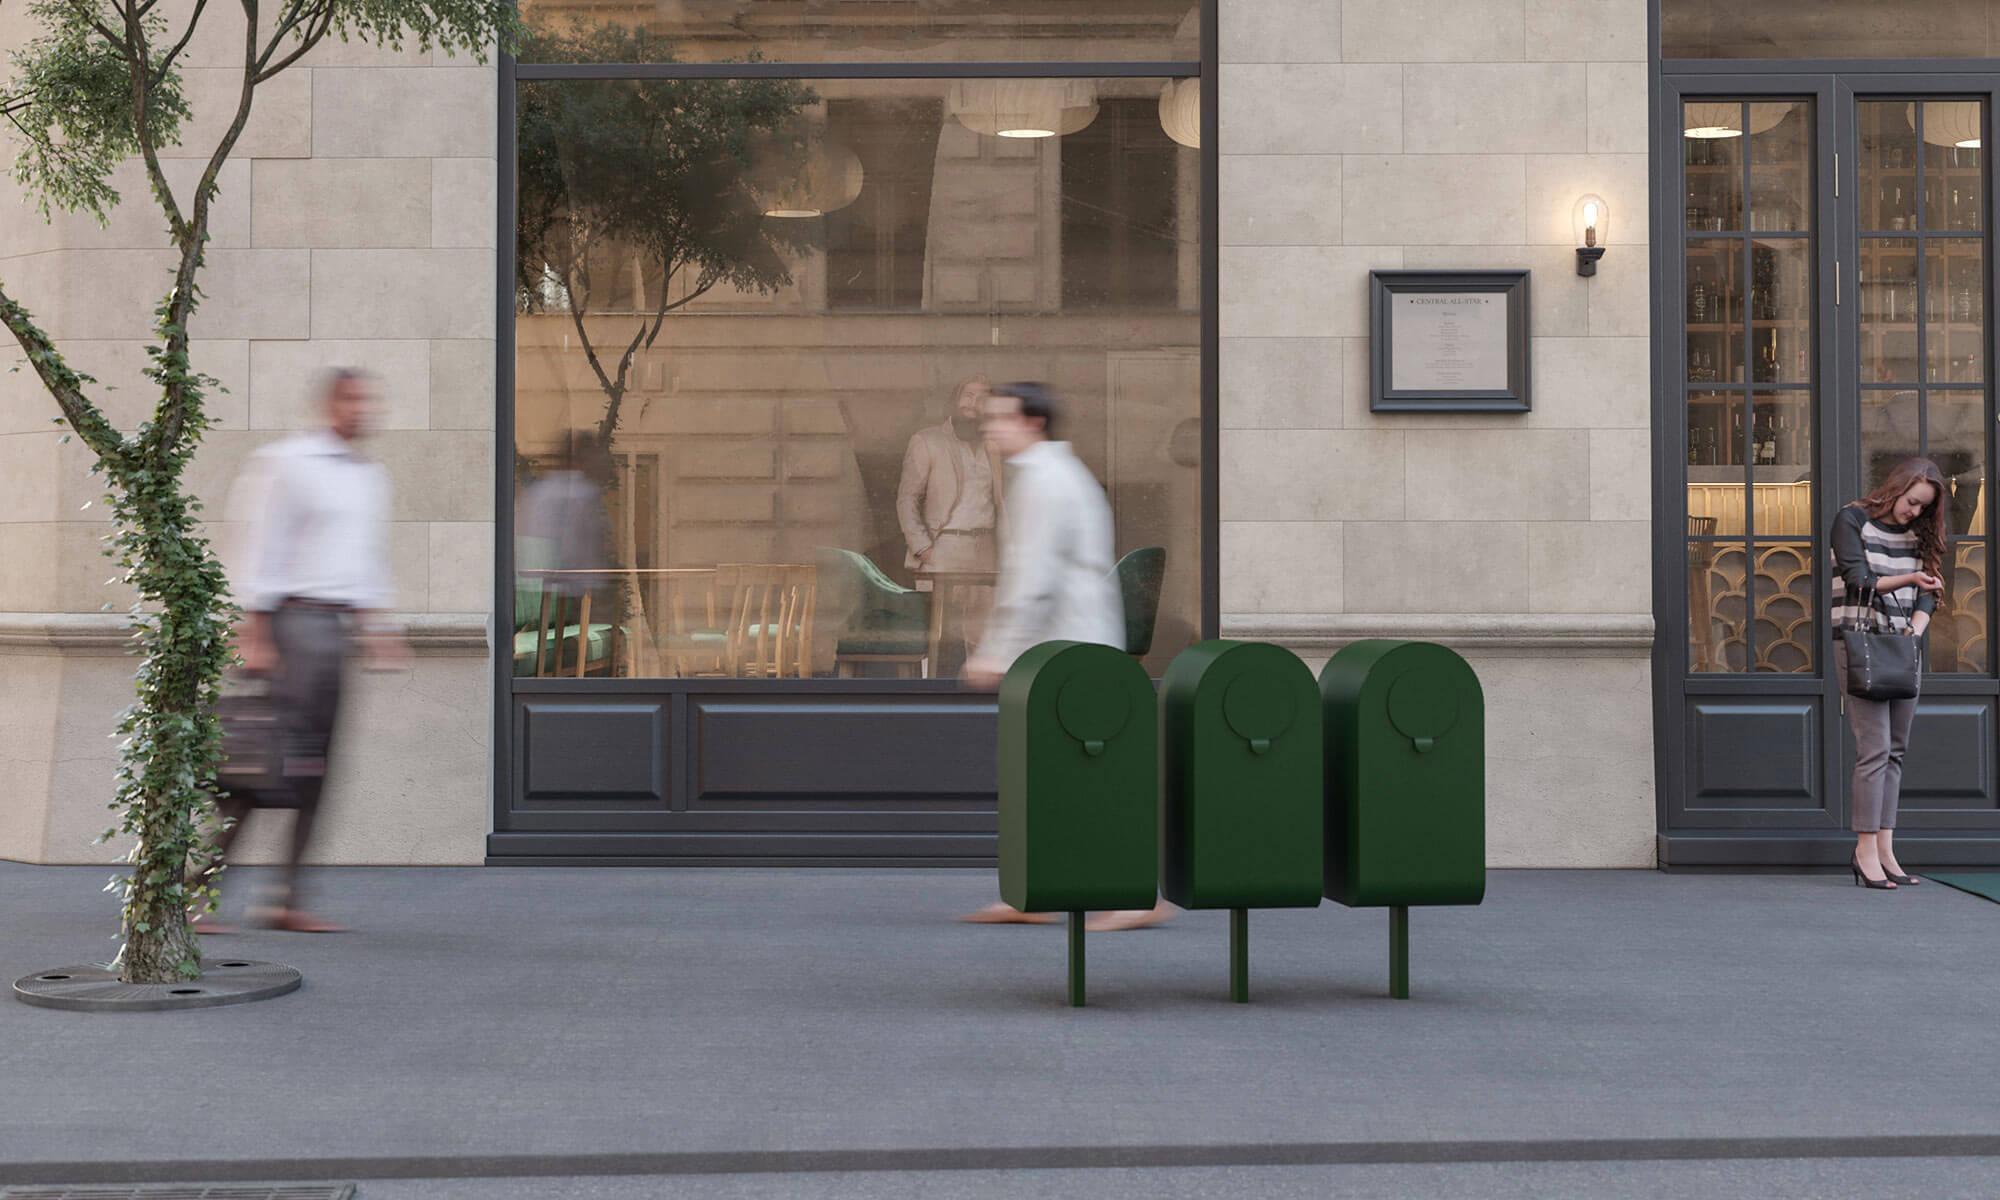 popsicle waste bin outdoors public environments recycling trece jangir maddadi